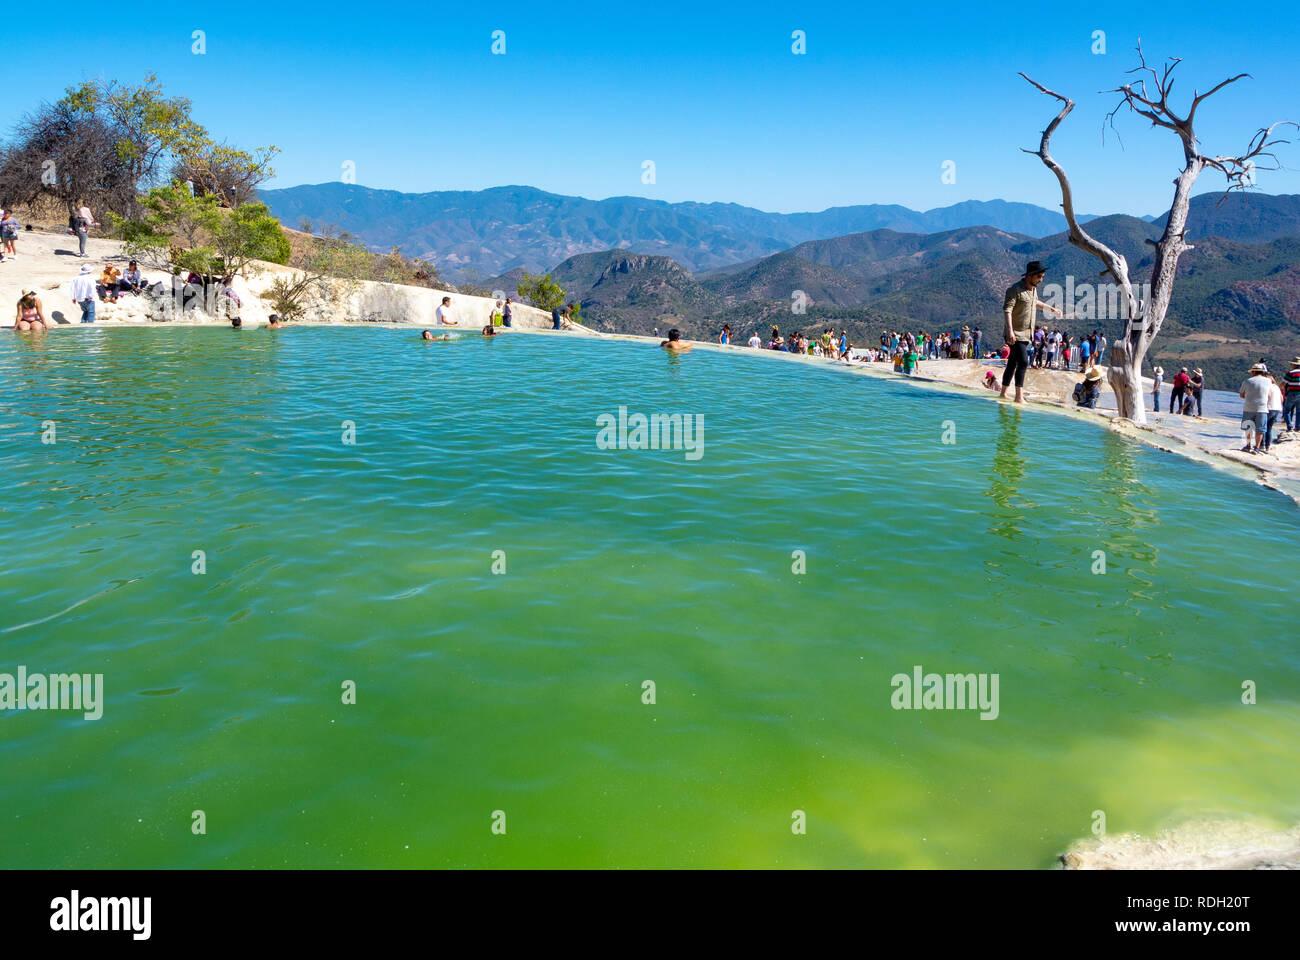 A lake done by , Petrified waterfall, Hierve el Agua, Oaxaca, Mexico Stock Photo